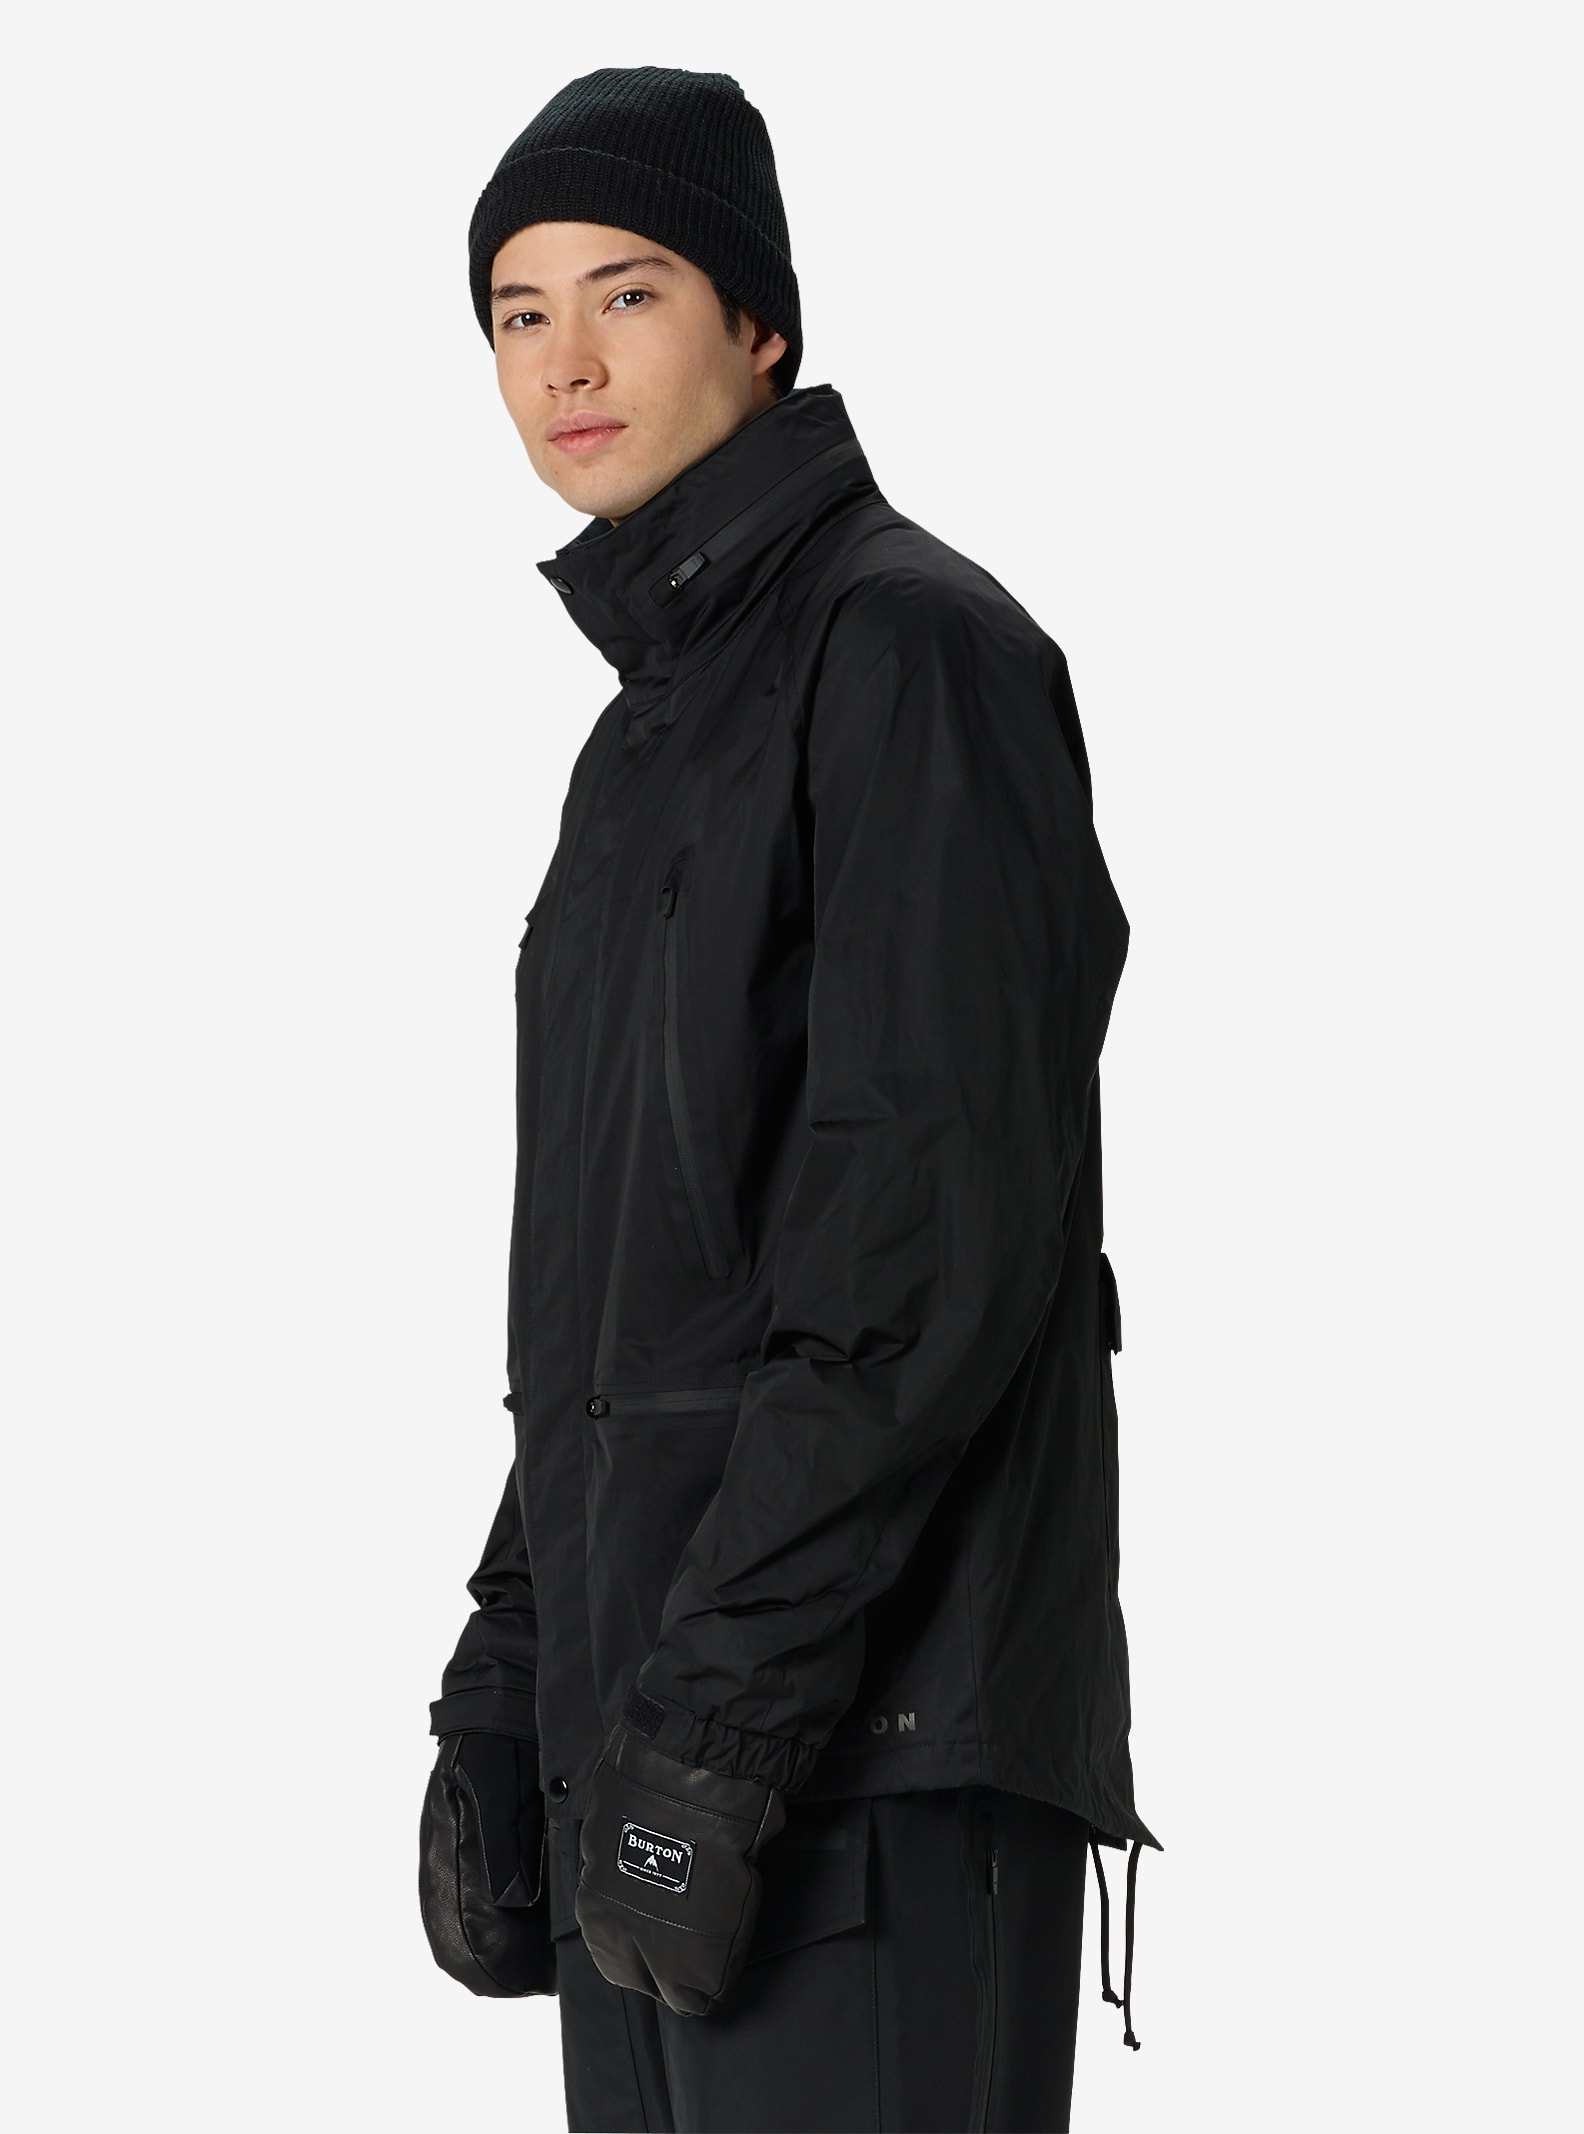 Mens jacket deals - Black Scale X Burton Harbor Jacket Shown In Black Scale Black